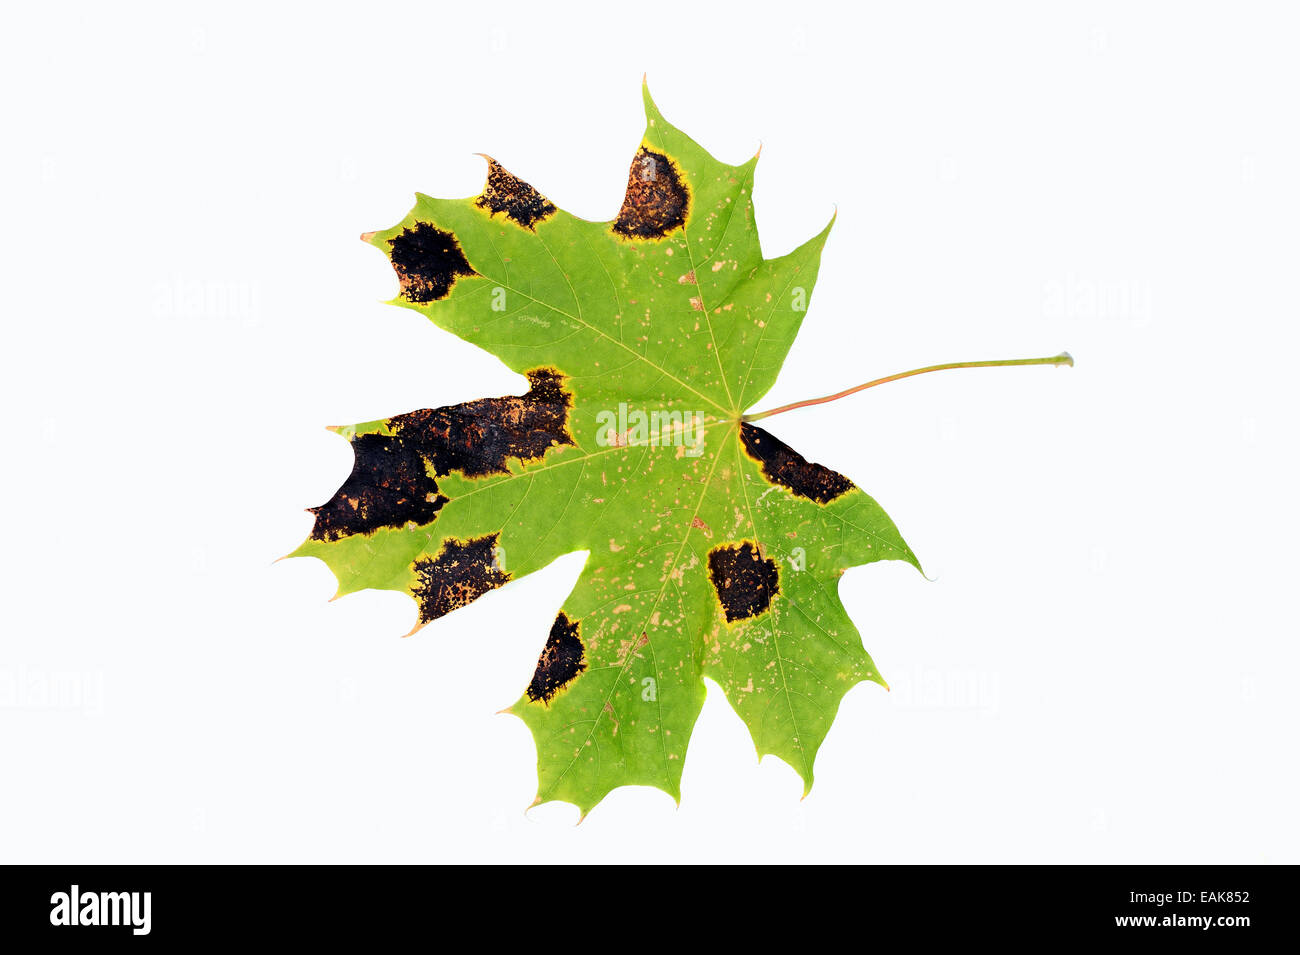 Tar Spot Fungus (Rhytisma acerinum) on the leaf of a Norway Maple (Acer platanoides), North Rhine-Westphalia, Germany - Stock Image